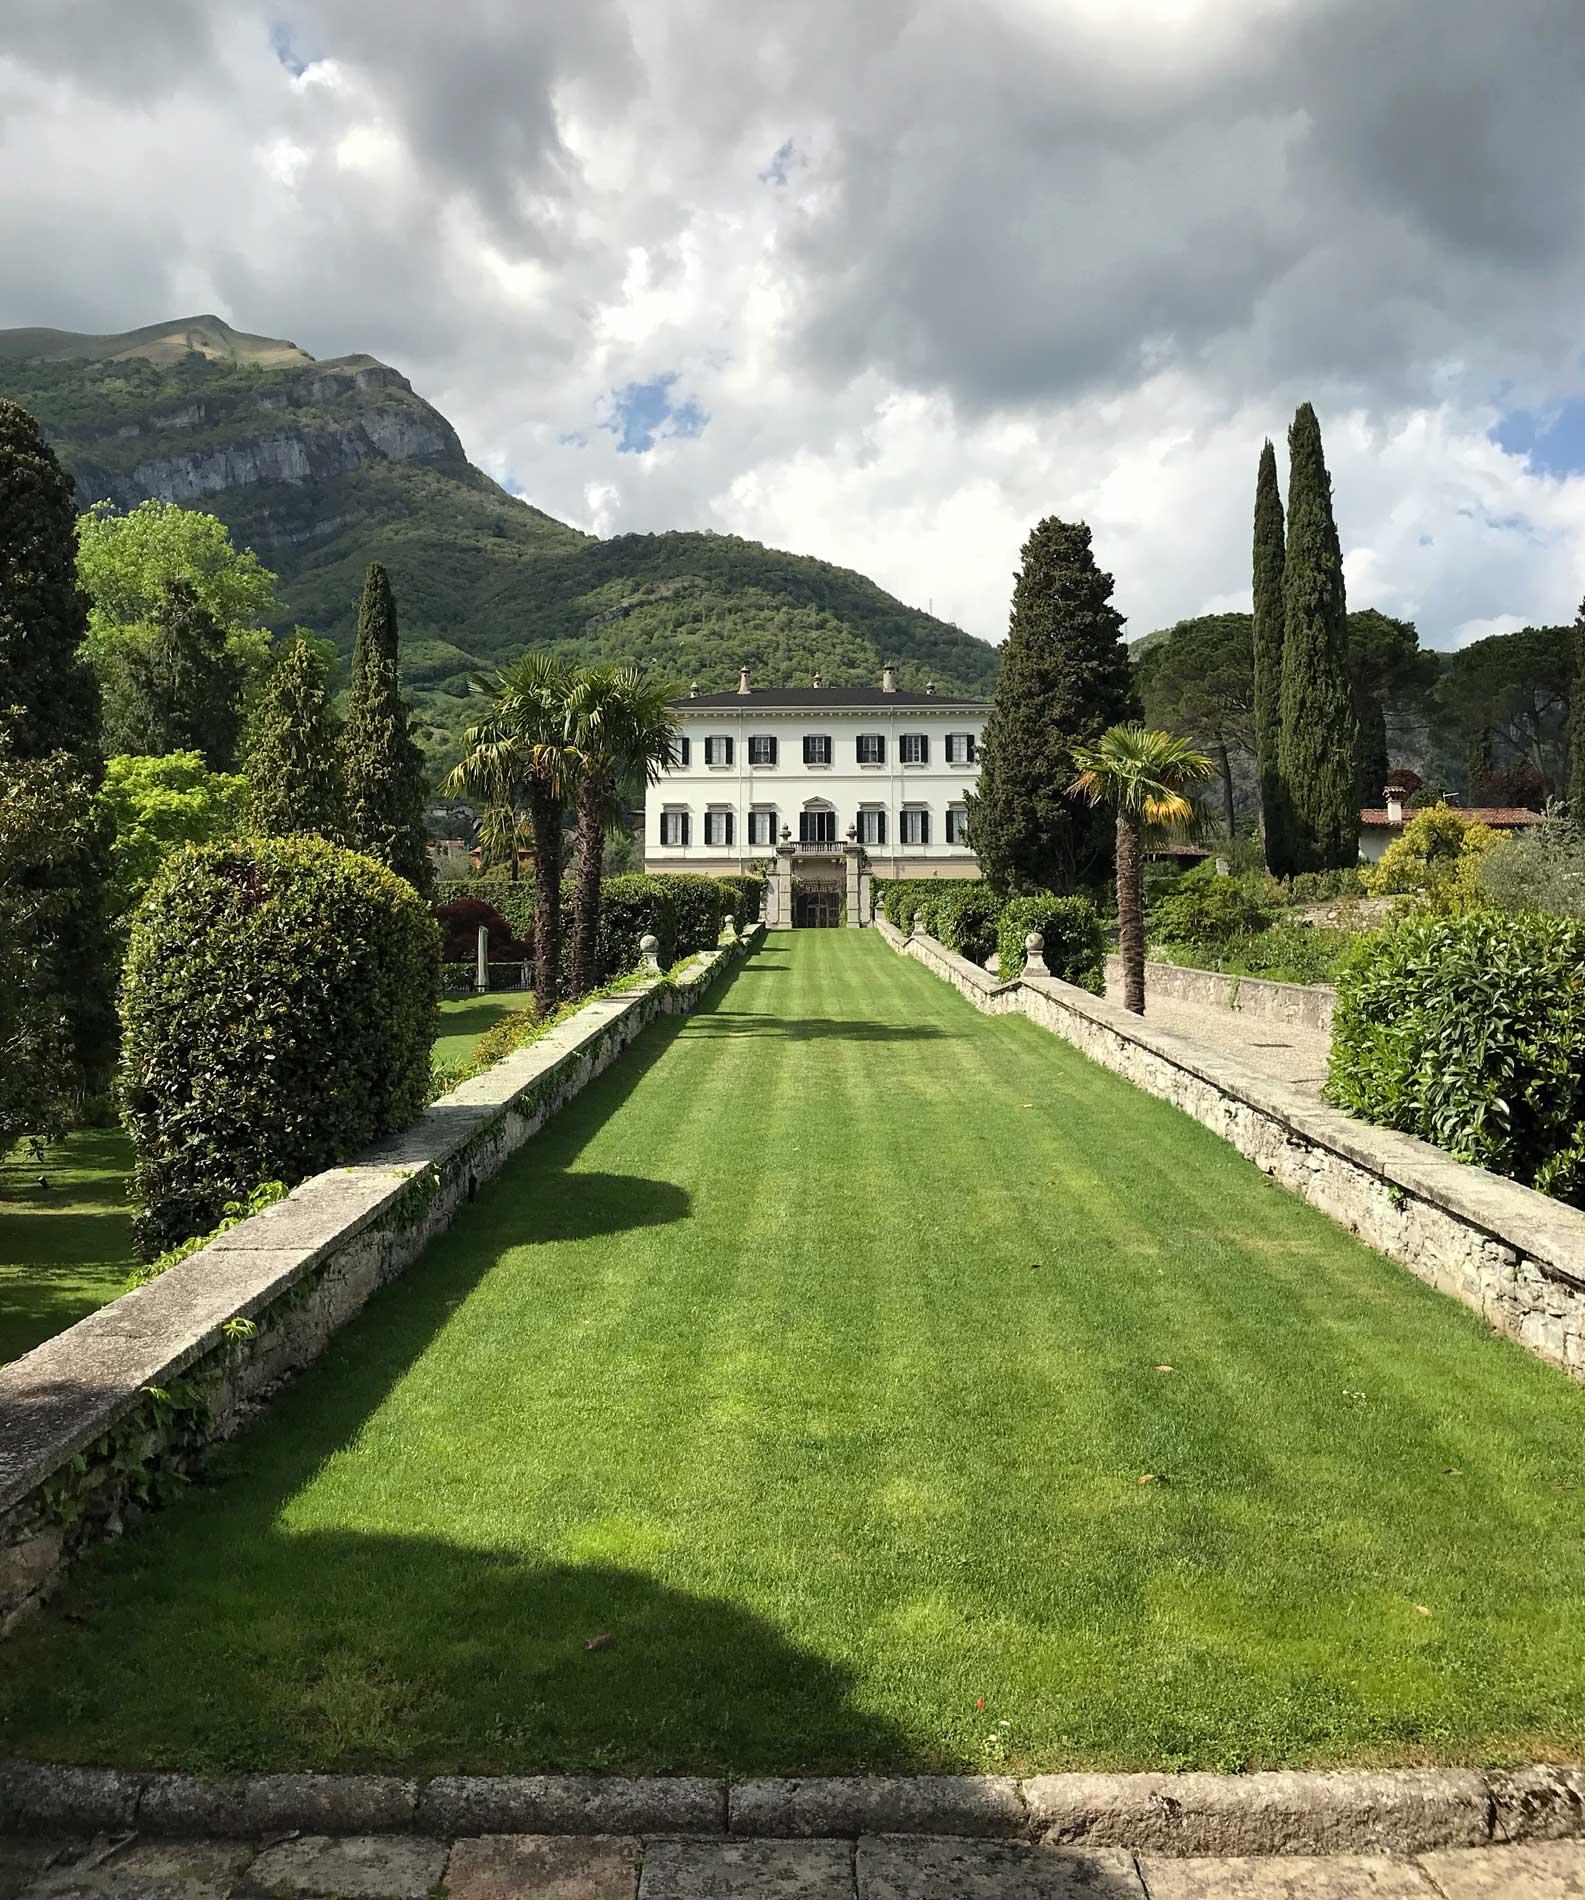 Villa-Carlia-Tremezzo-Bolvedro-ingresso-giardino-facciata